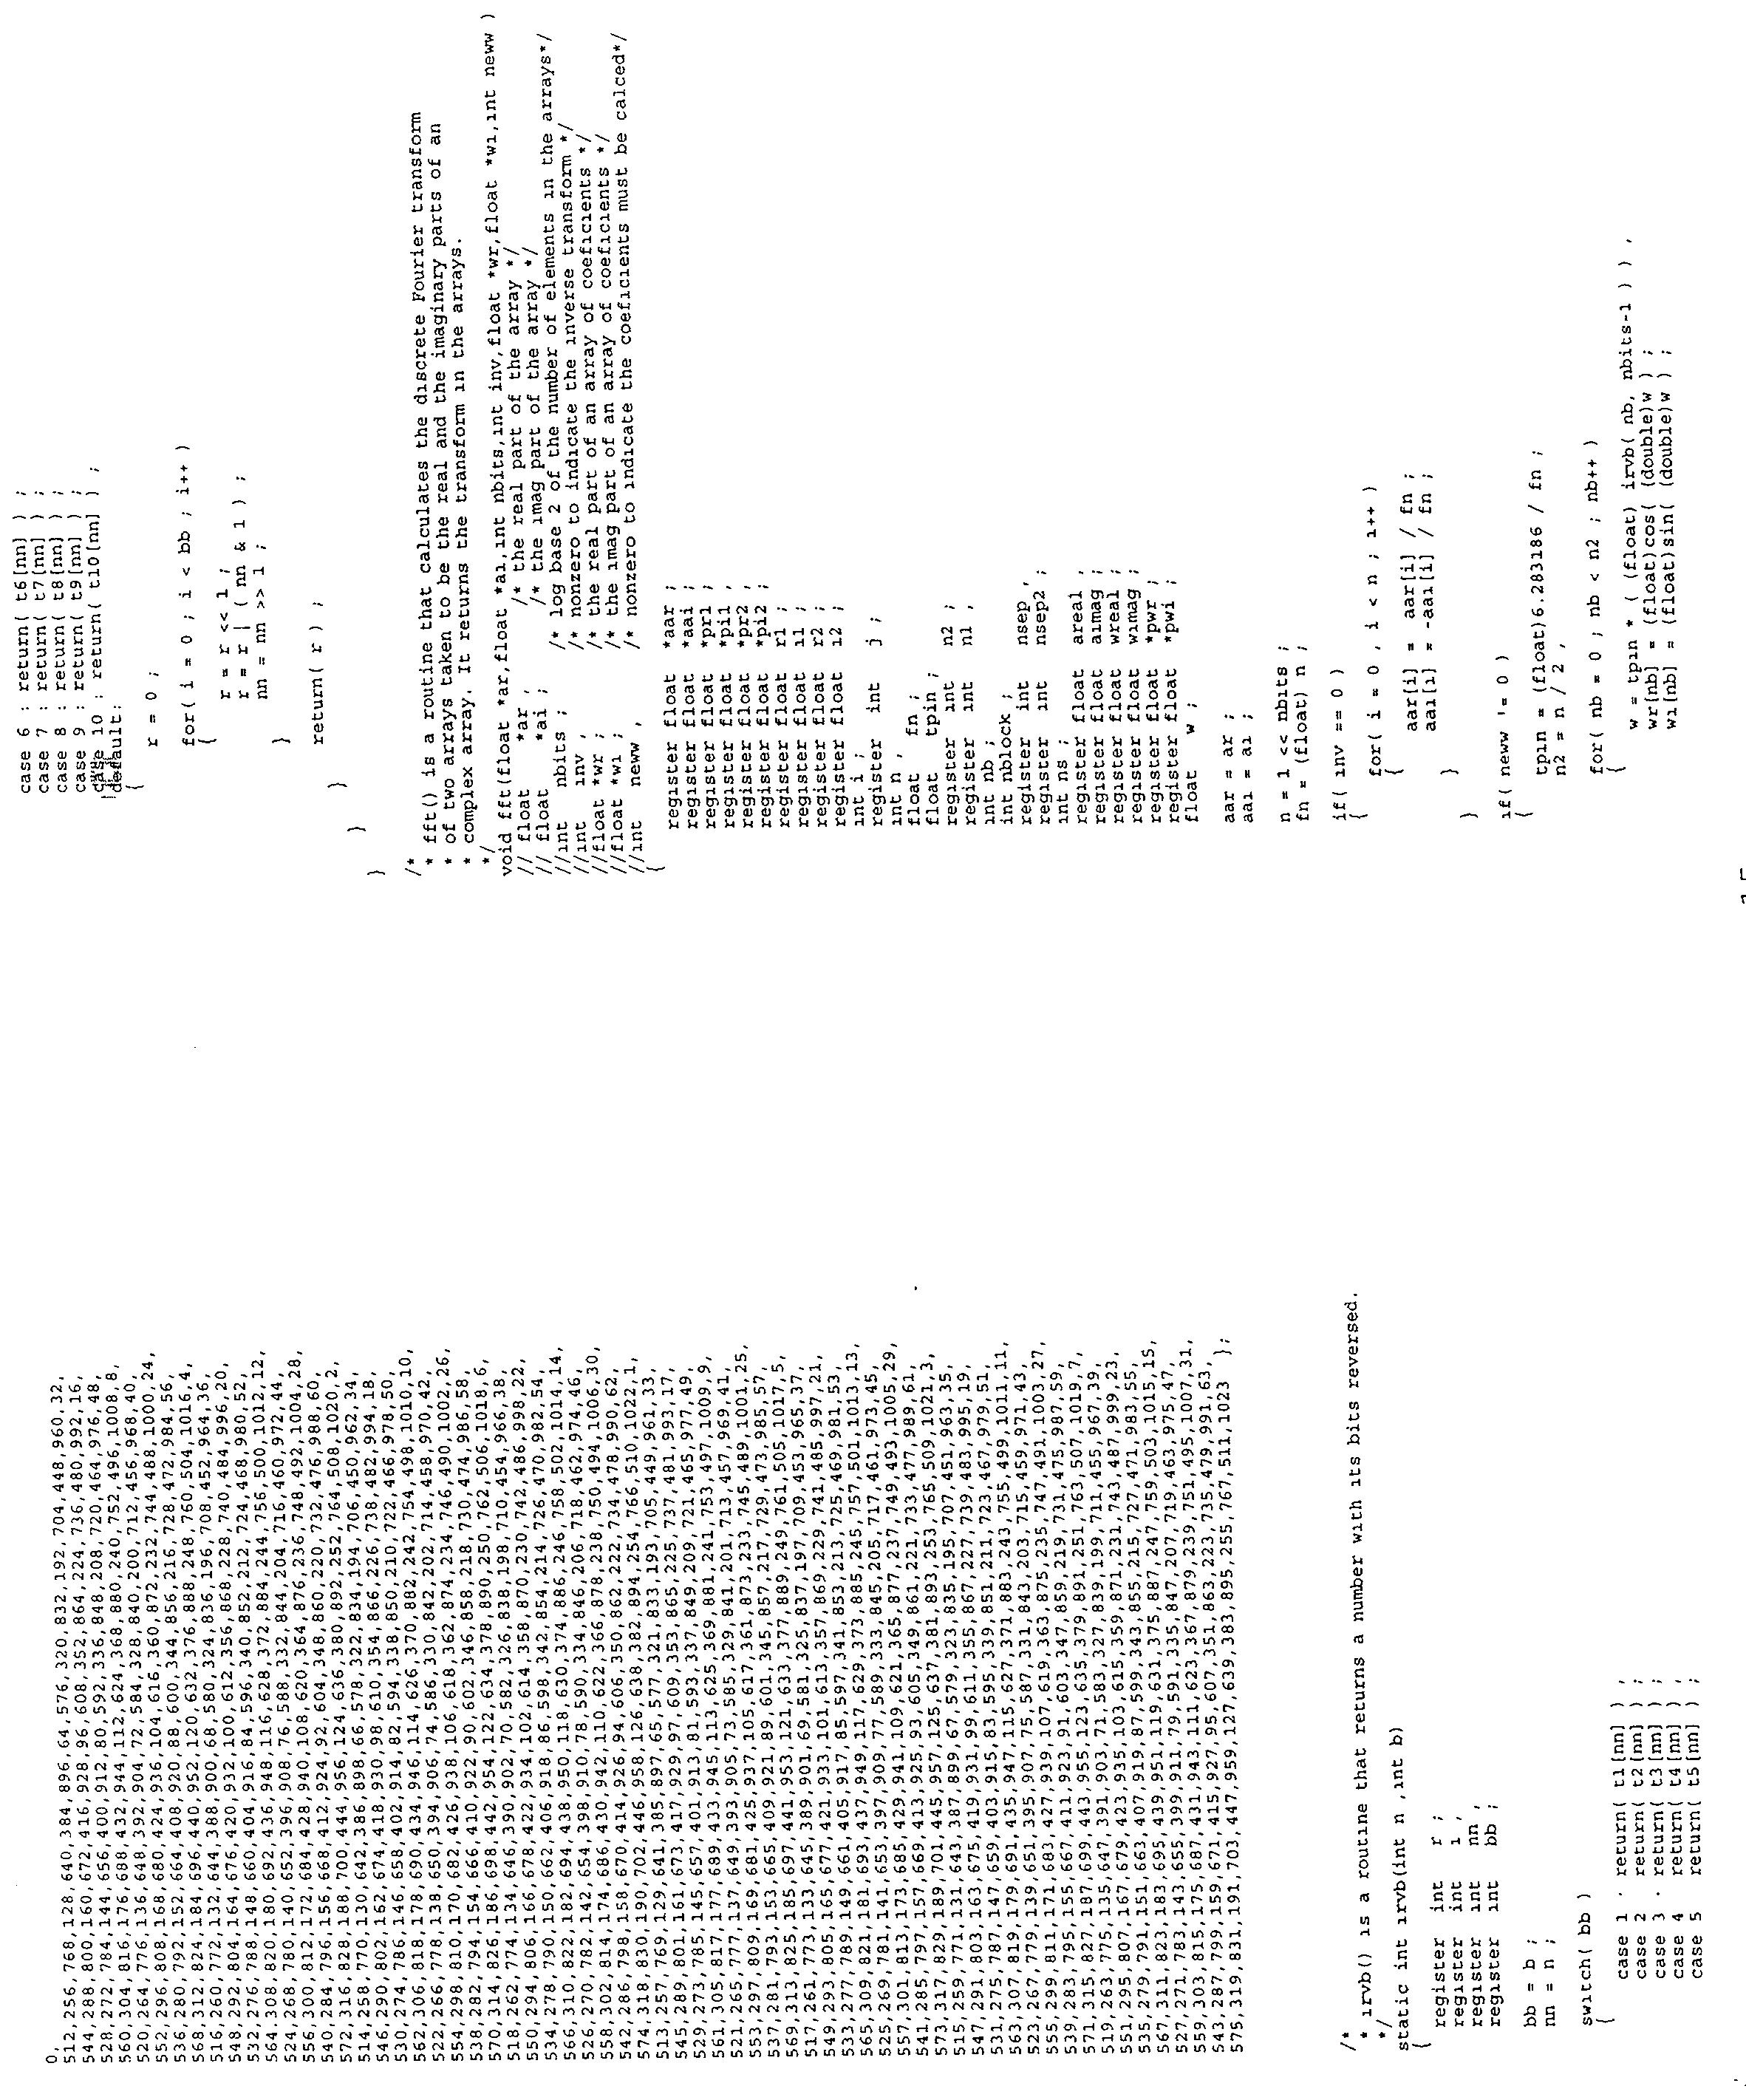 Figure US20020118831A1-20020829-P00037